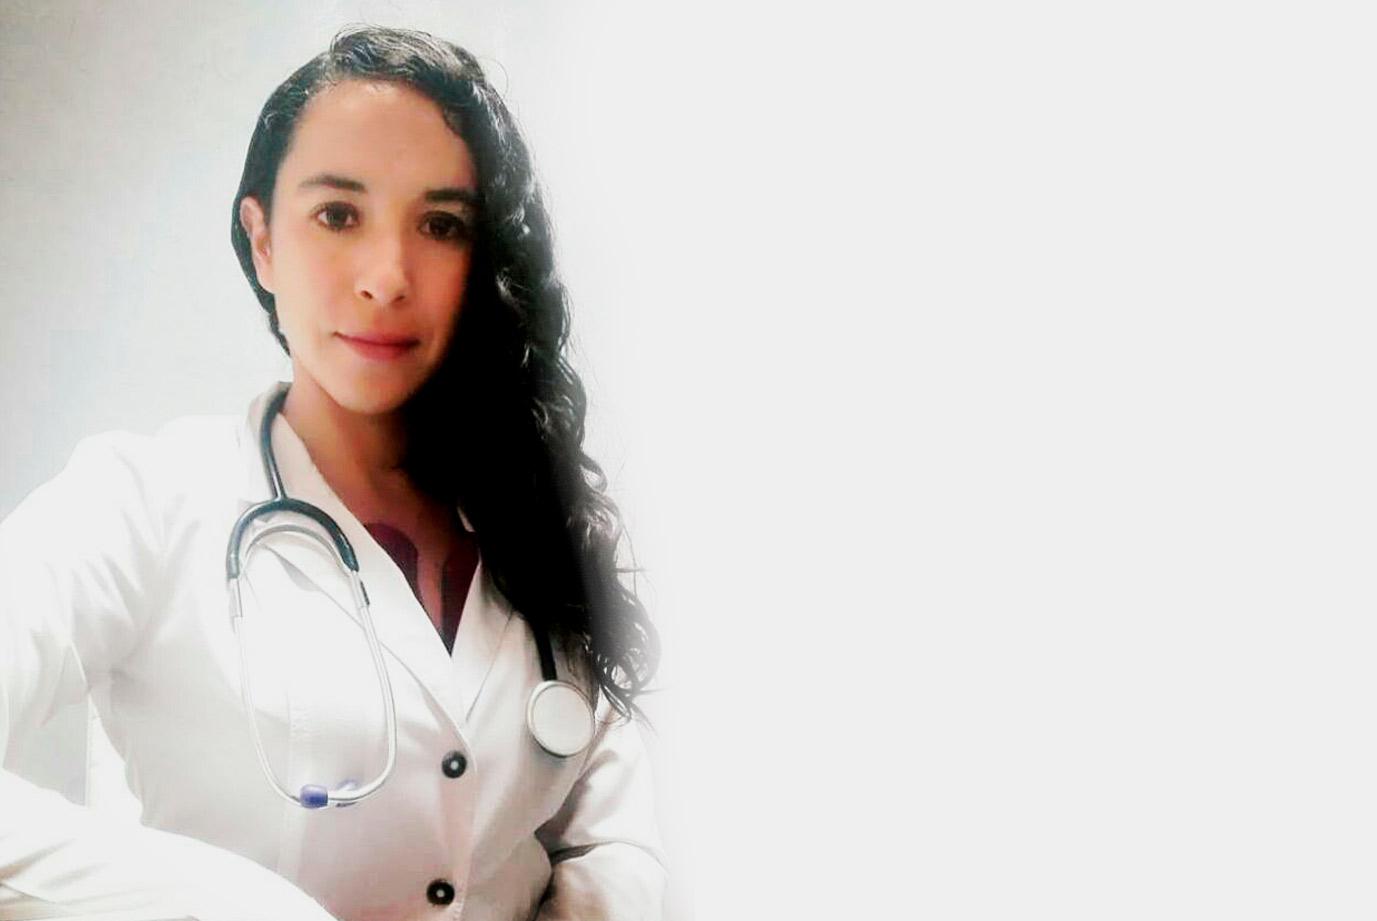 Dra. Michelle Cruz